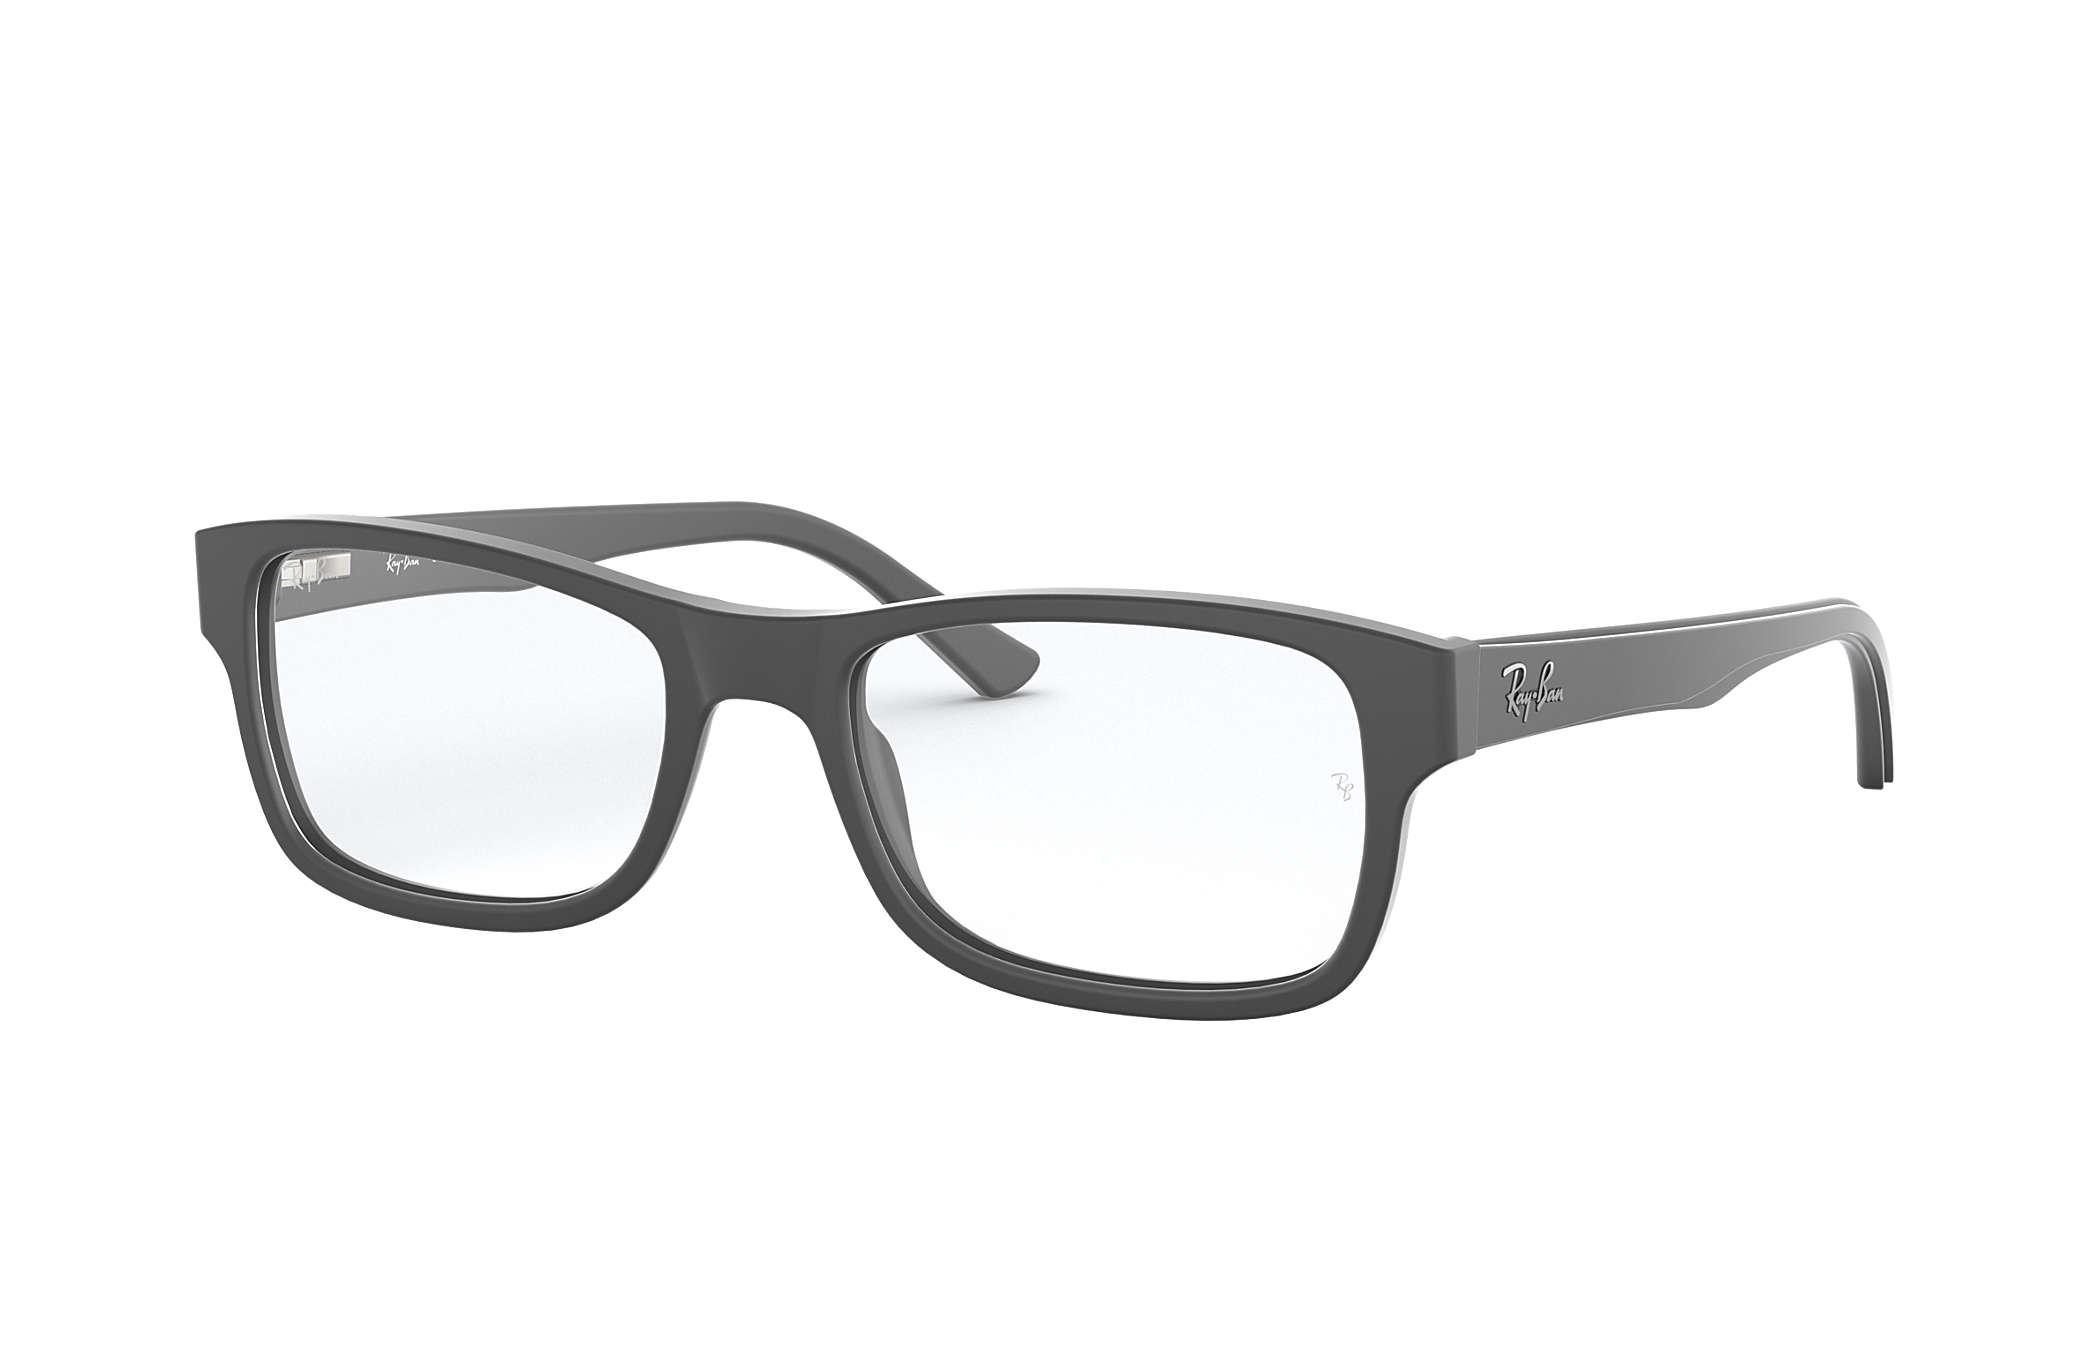 a5b626bde4 Ray-Ban prescription glasses RB5268 Grey - Acetate - 0RX5268558252 ...